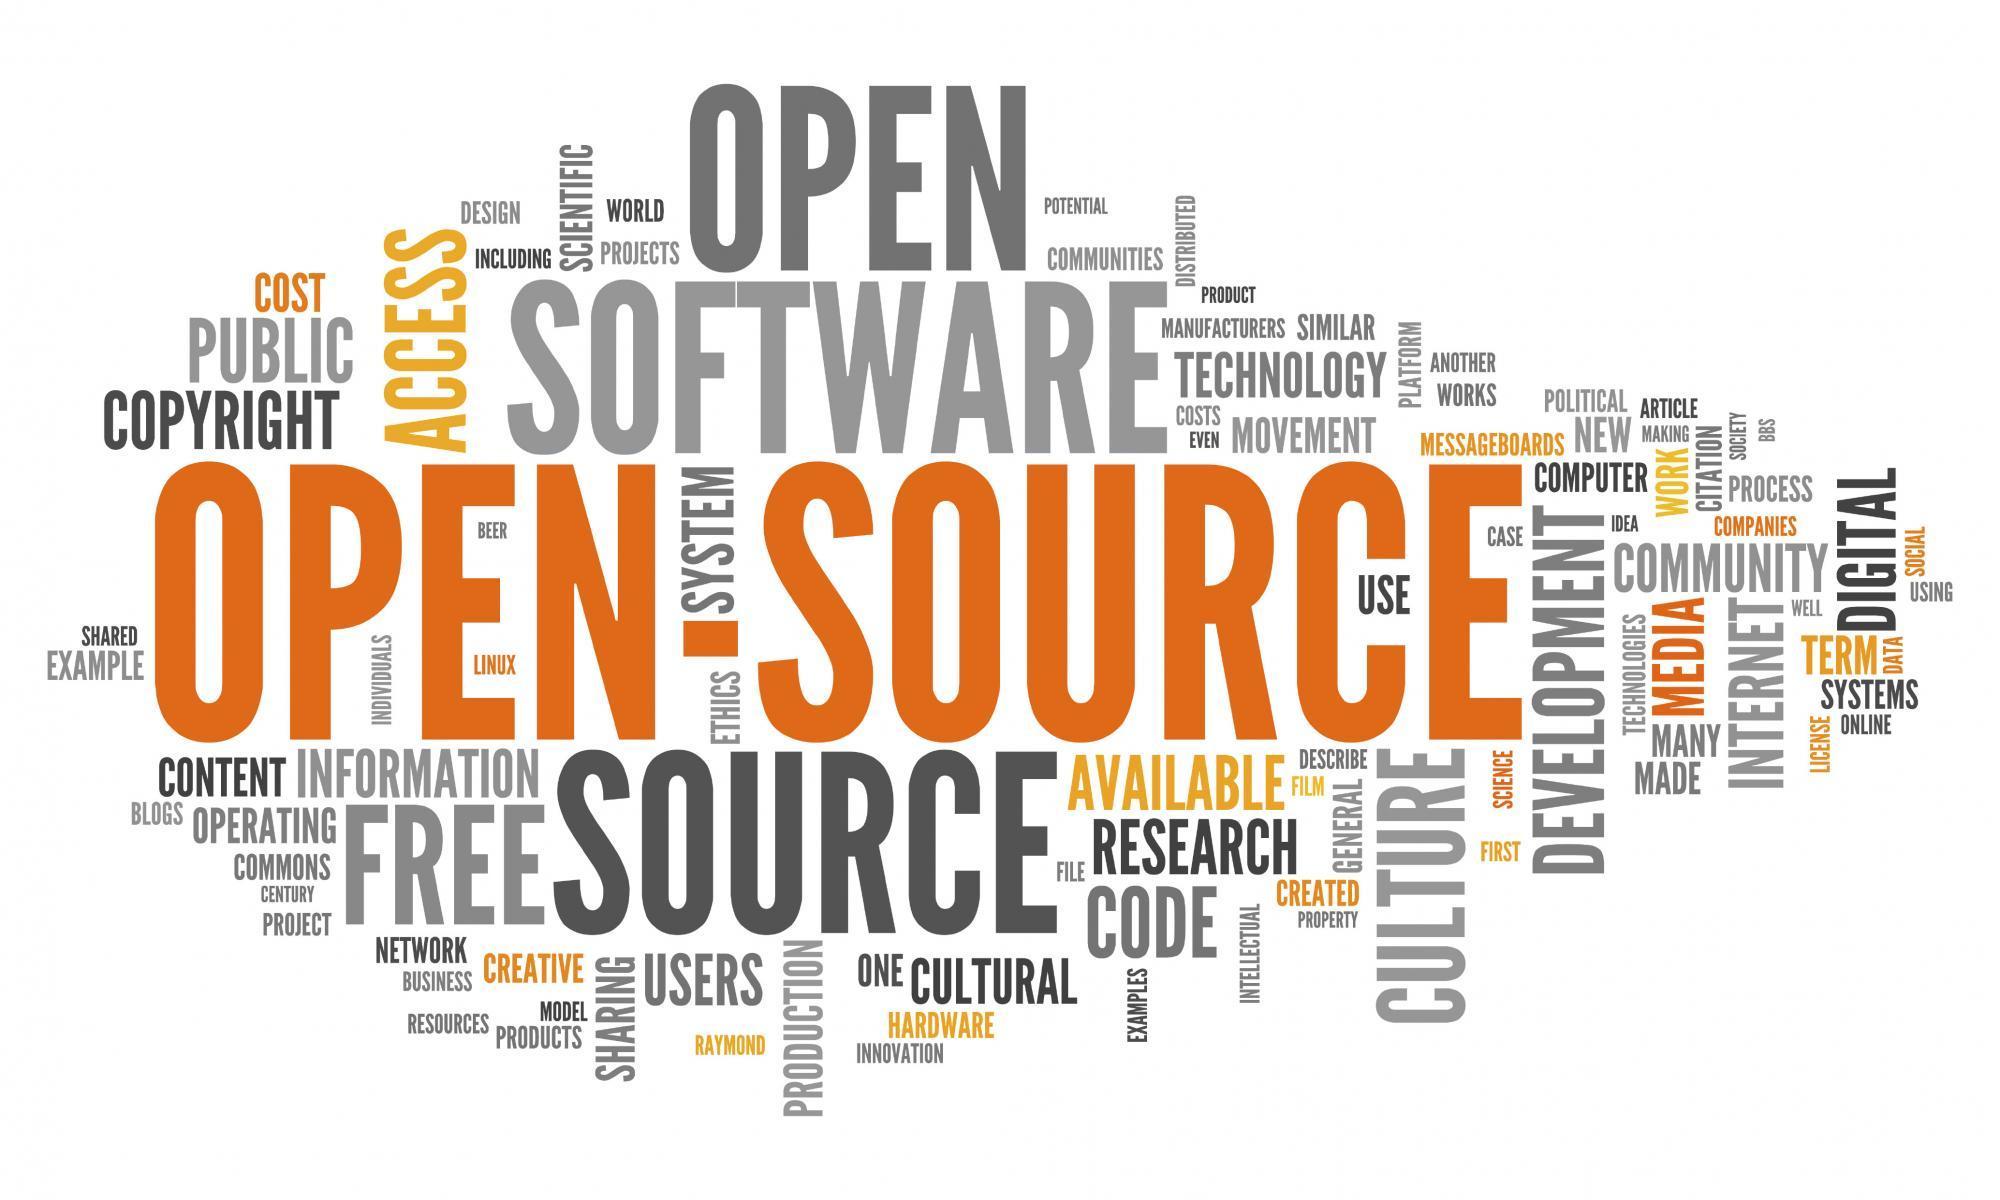 Logiciels Open Source